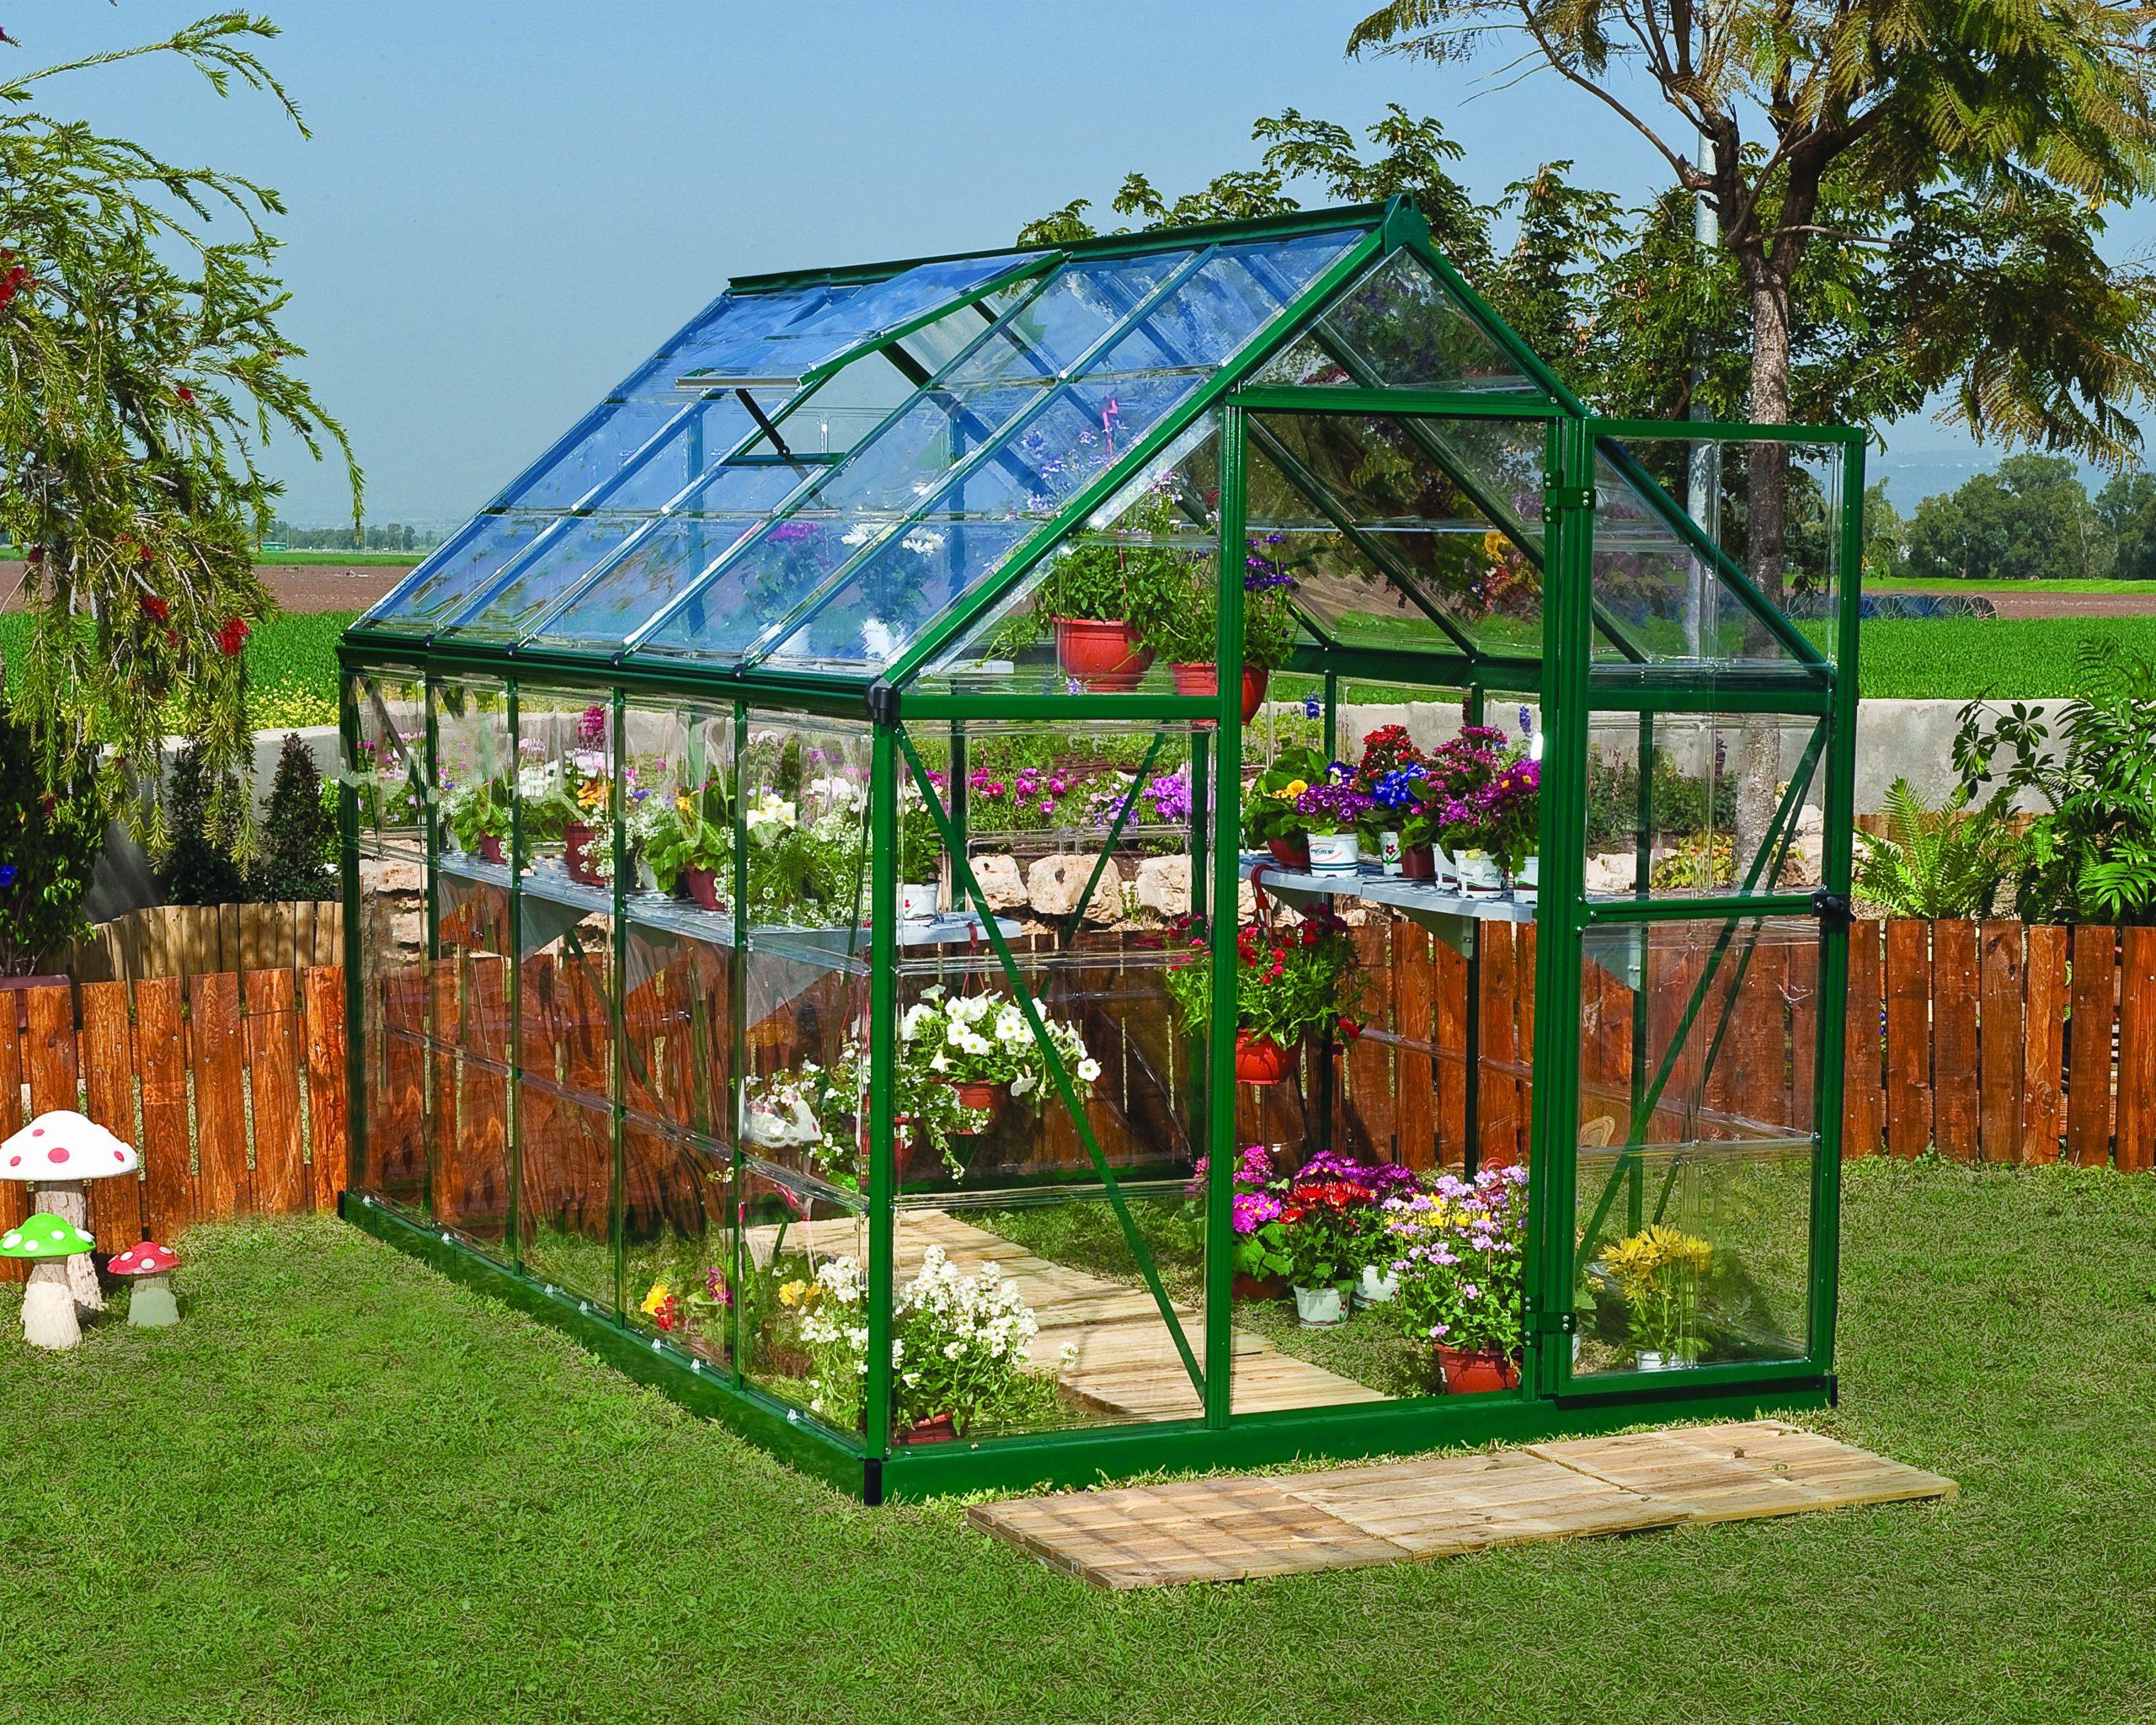 Serre De Jardin Leroy Merlin - Idees Conception Jardin intérieur Serre De Jardin Leroy Merlin